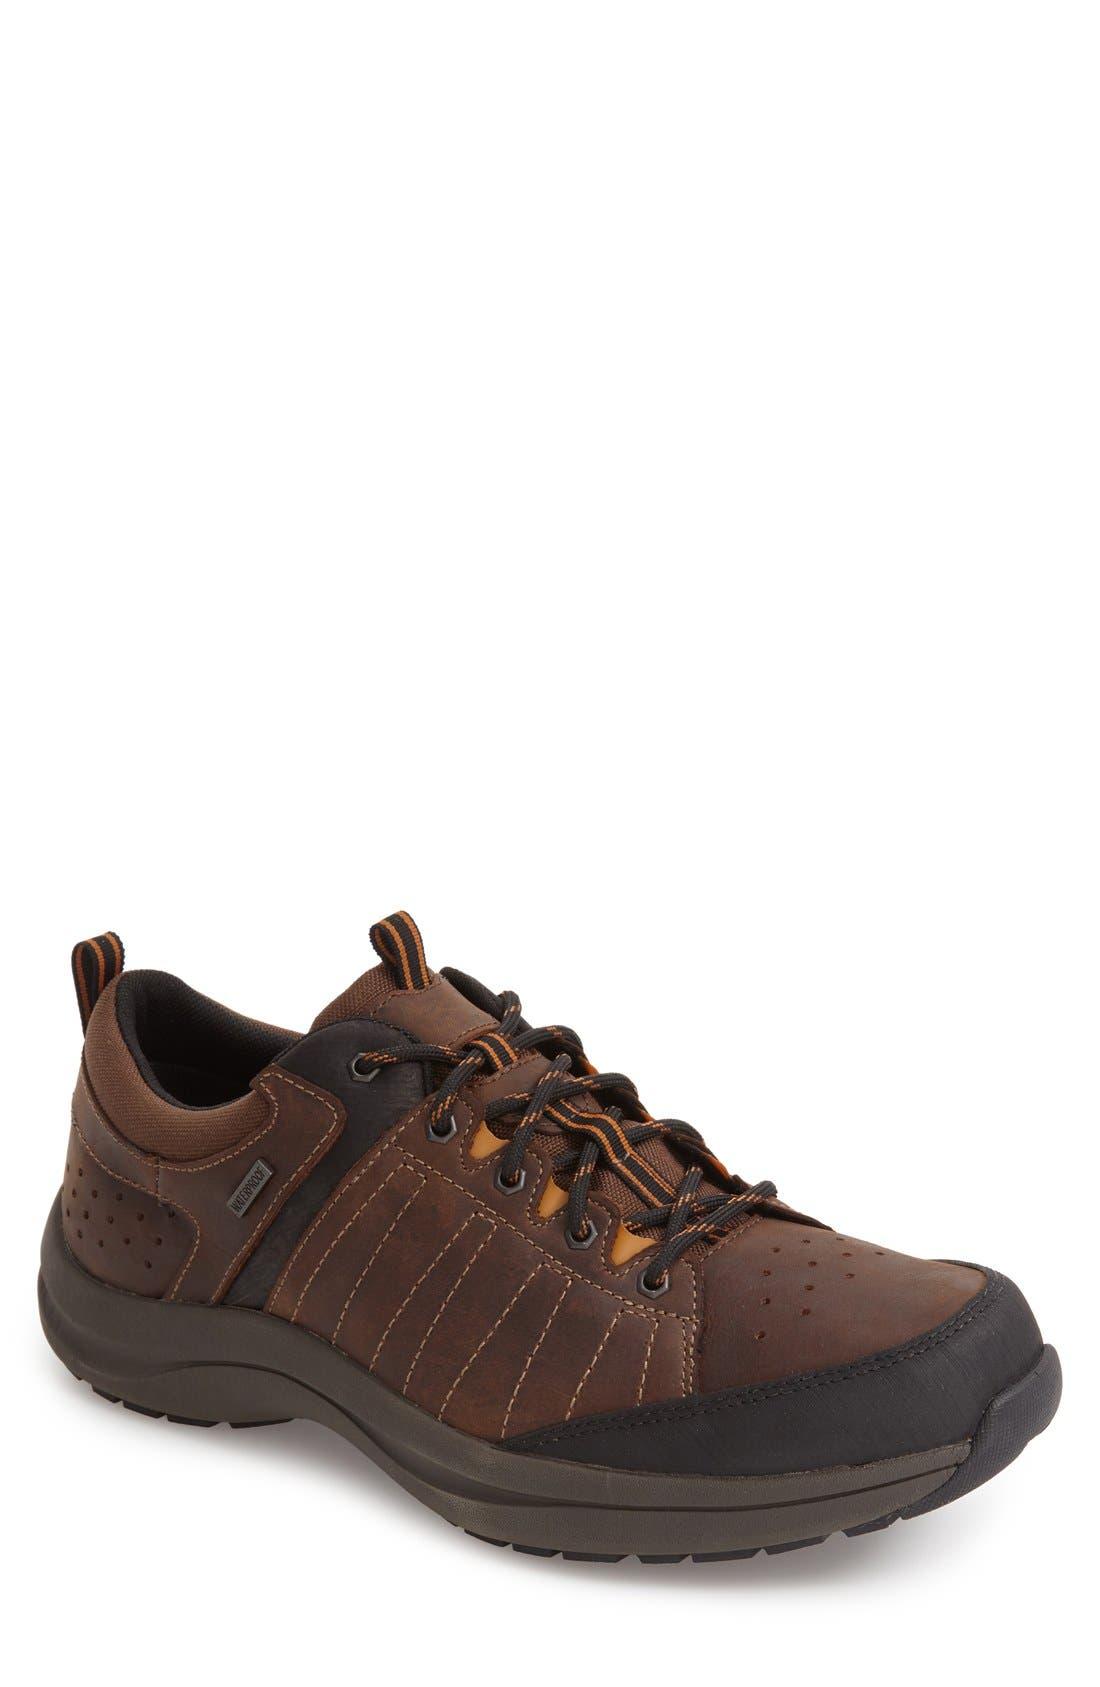 Seth-Dun Waterproof Sneaker,                             Main thumbnail 1, color,                             BROWN LEATHER